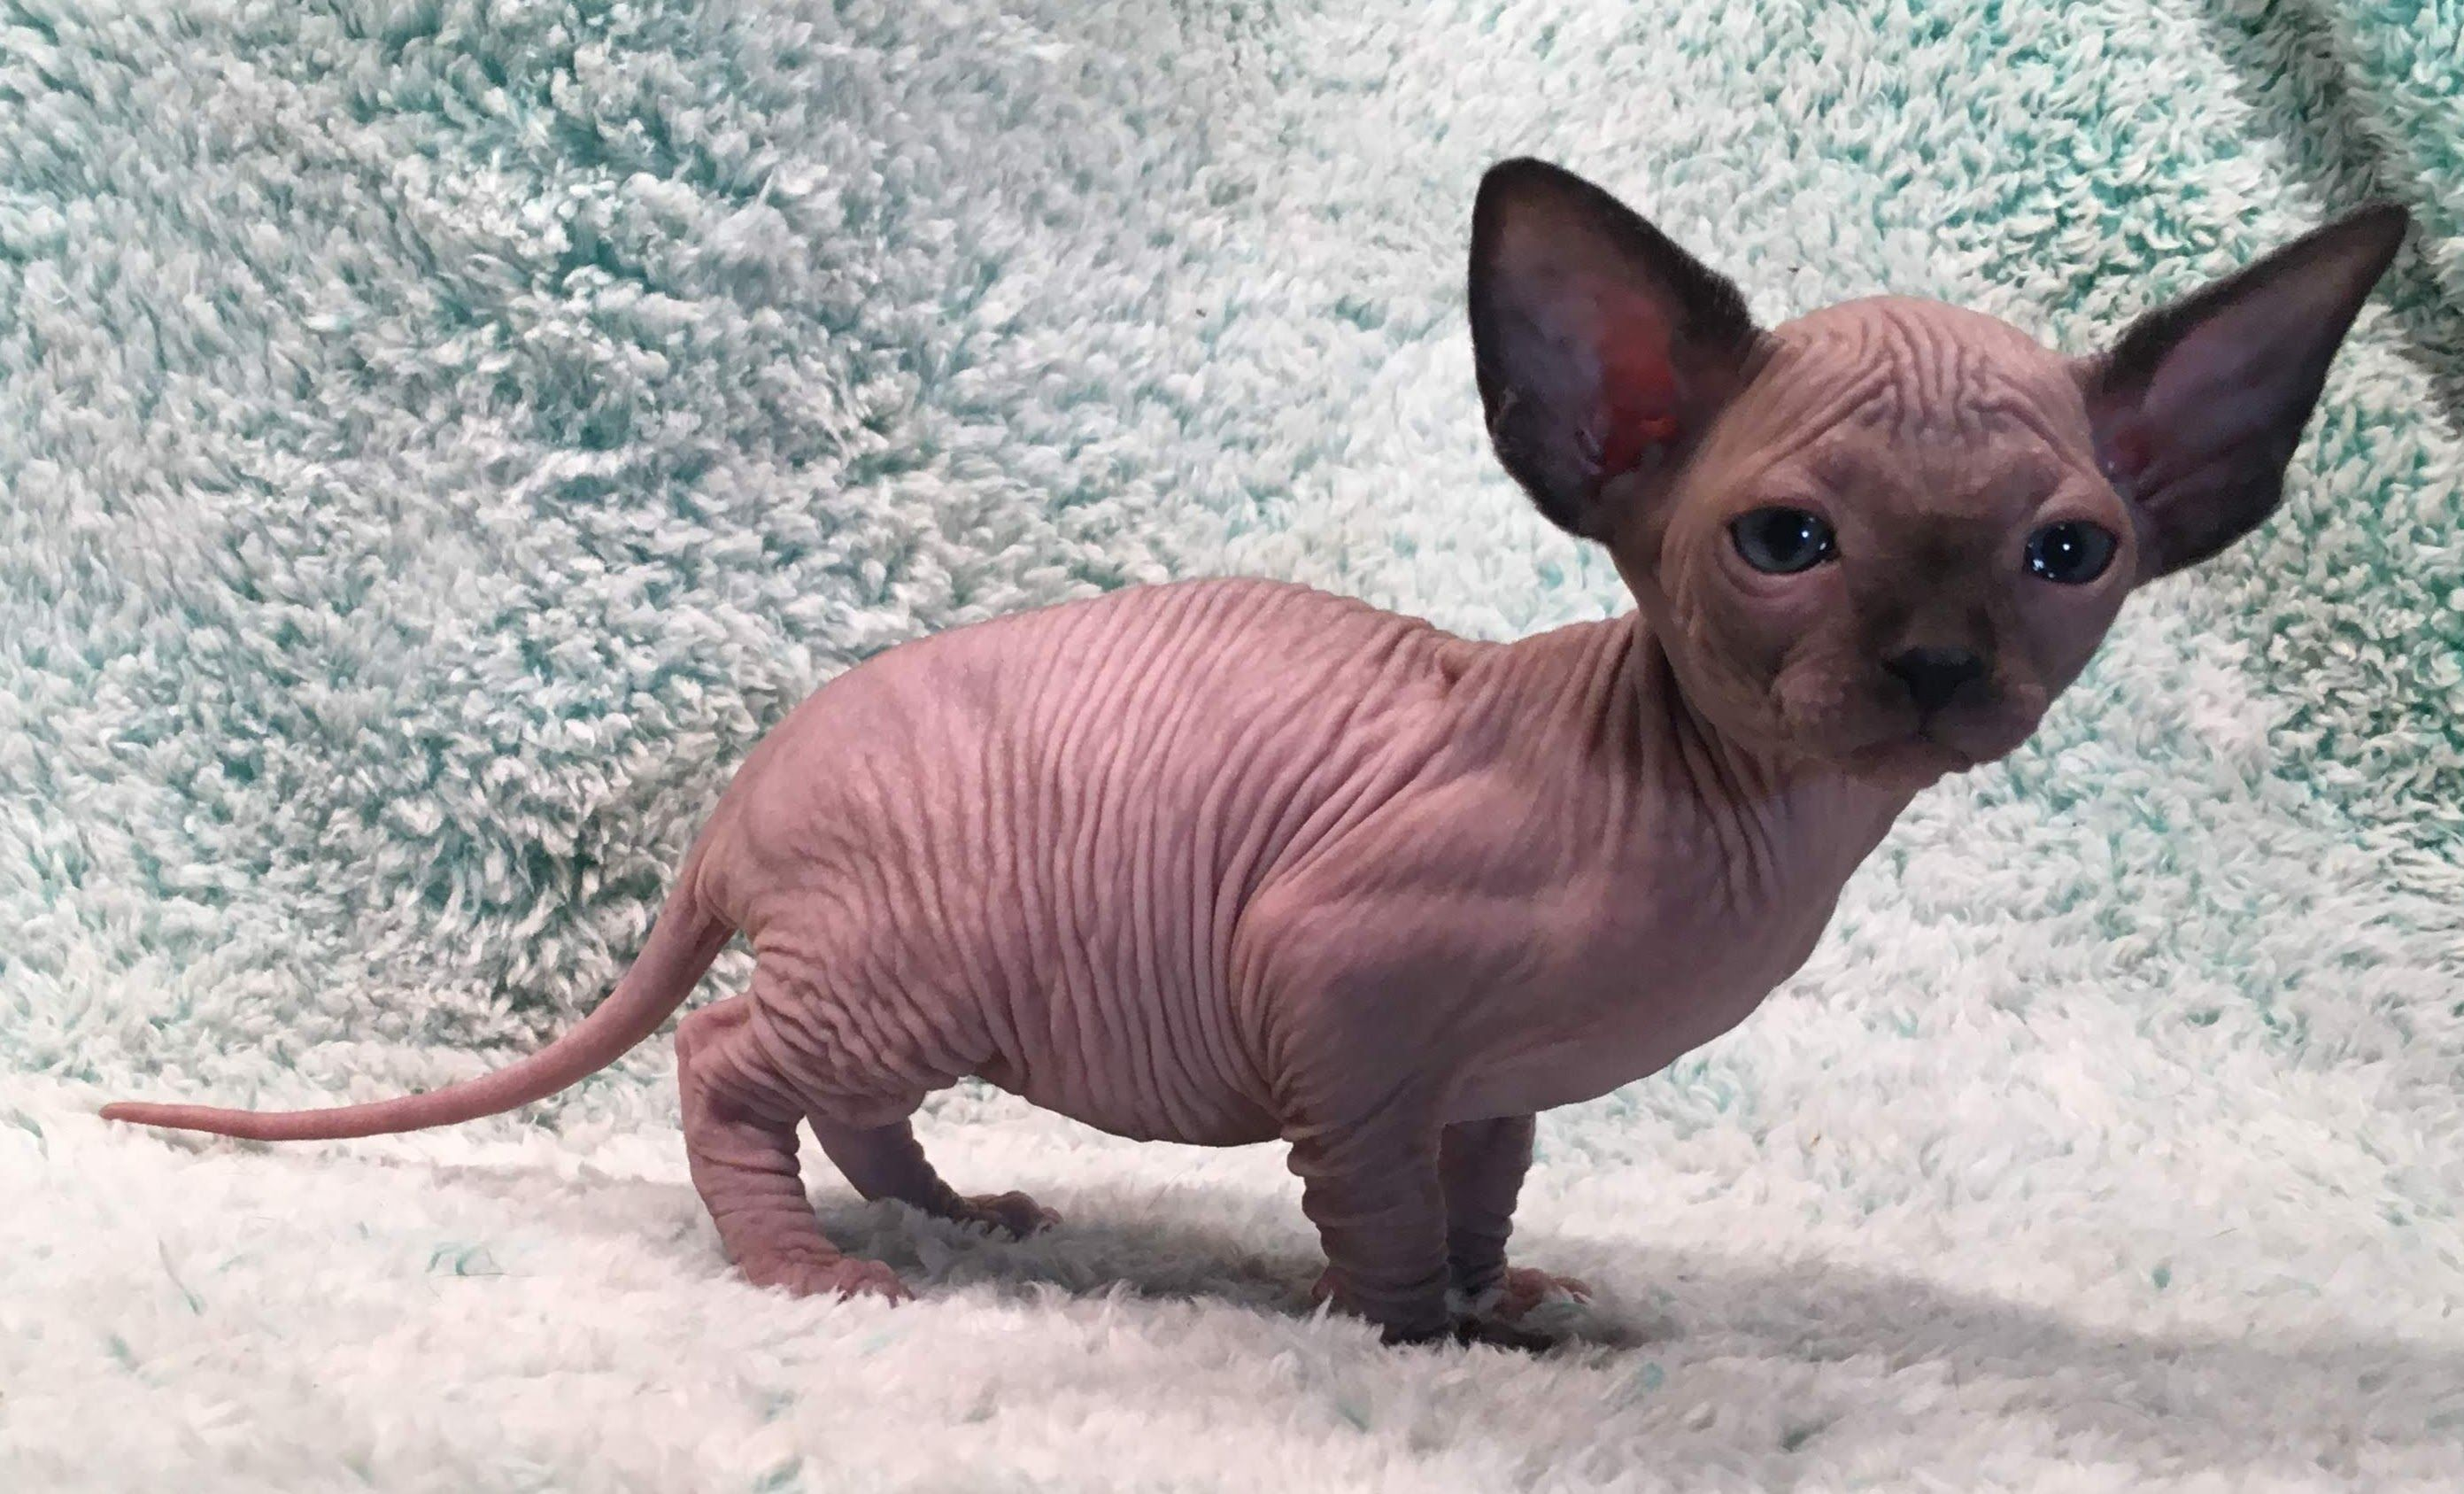 Pin By Kendallardan On Cute Baby Animals Baby Animals Cute Baby Animals Sphynx Kittens For Sale